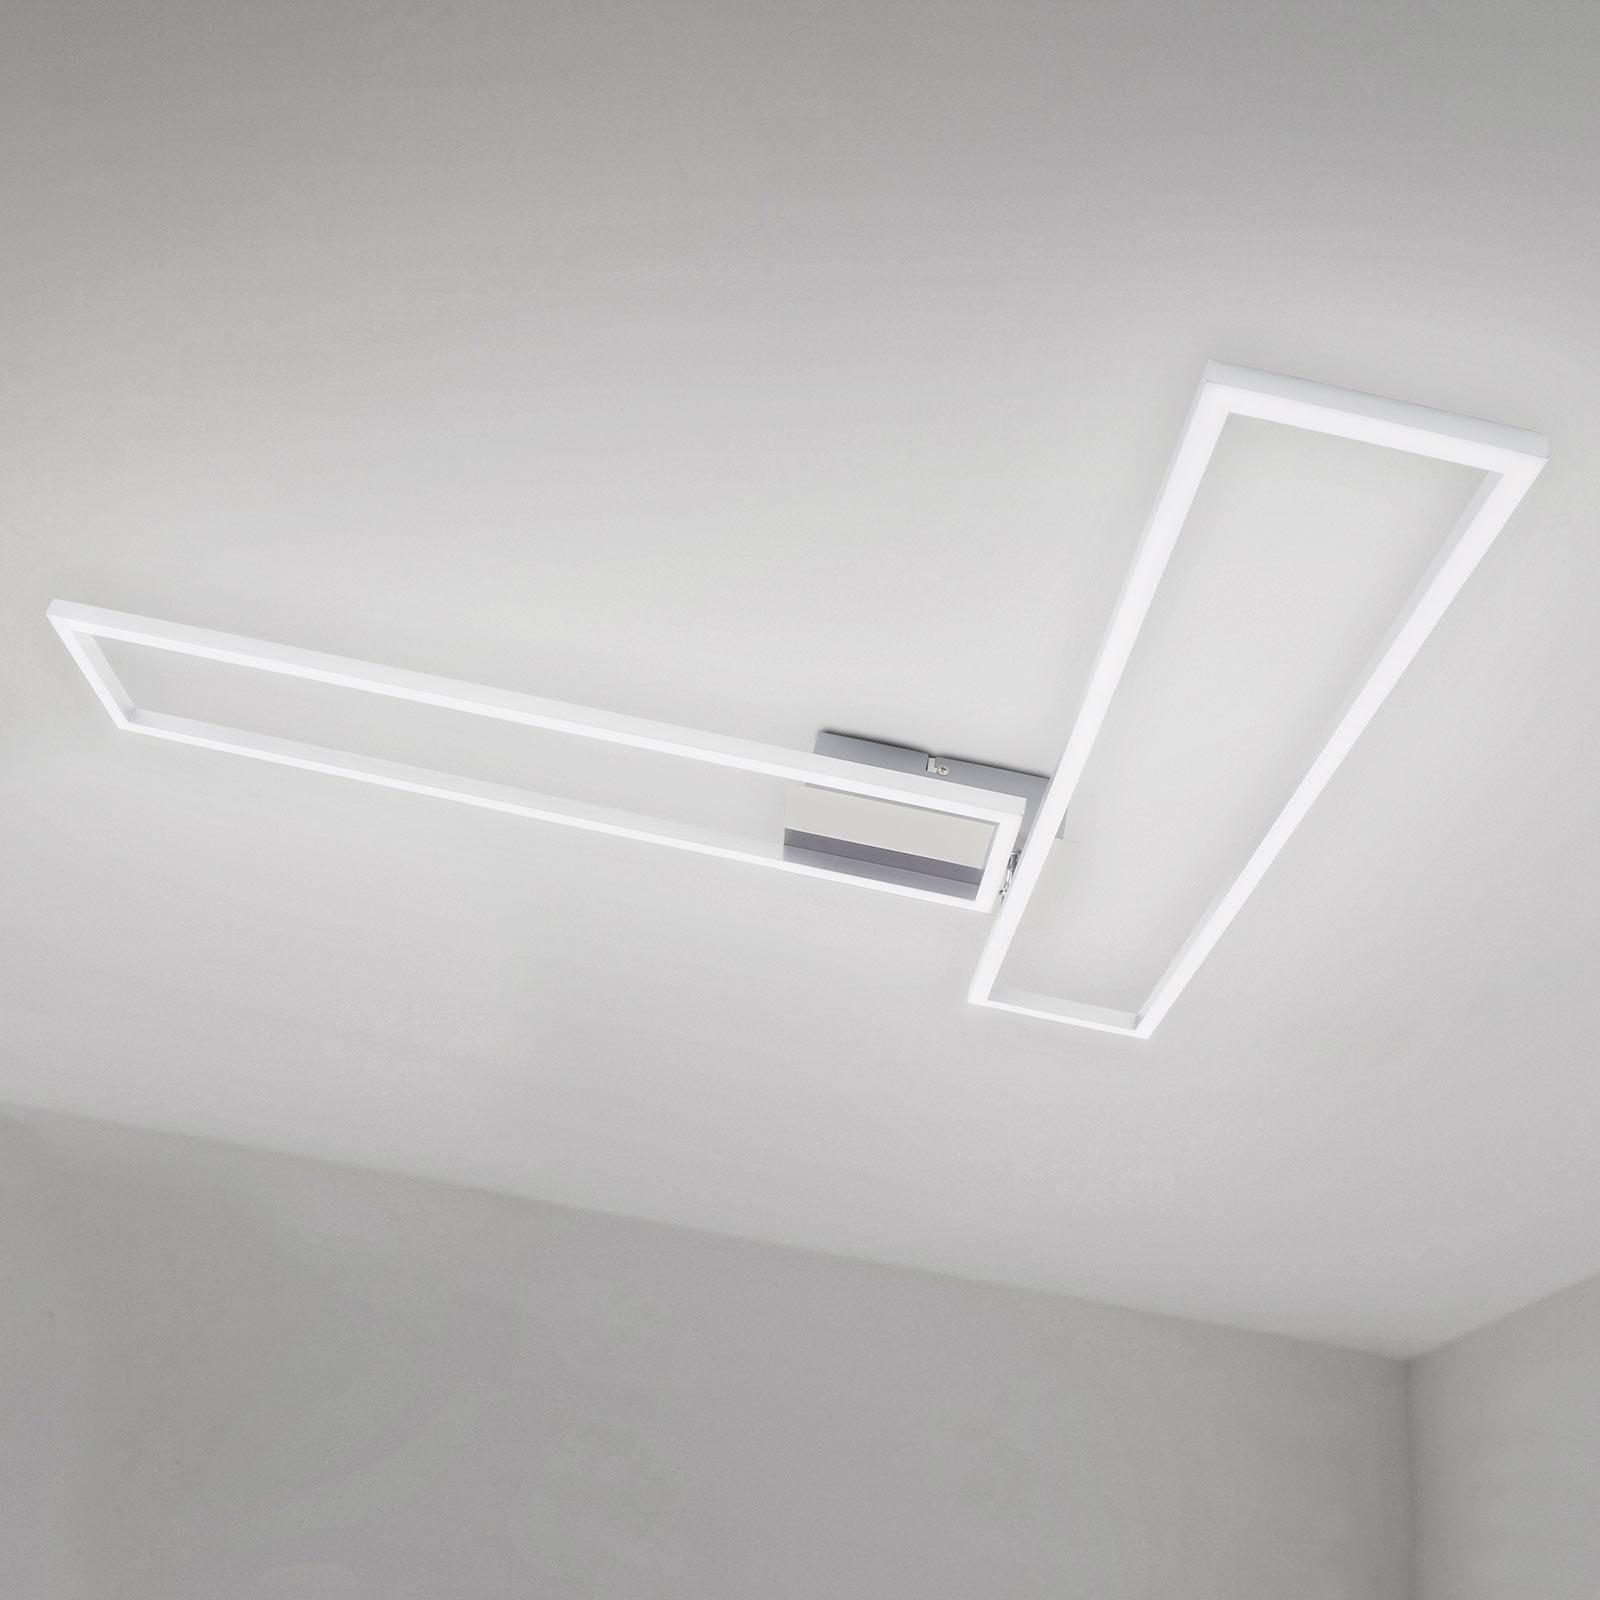 Deckenlampe Frame WiFi CCT, Fernbedienung, alu